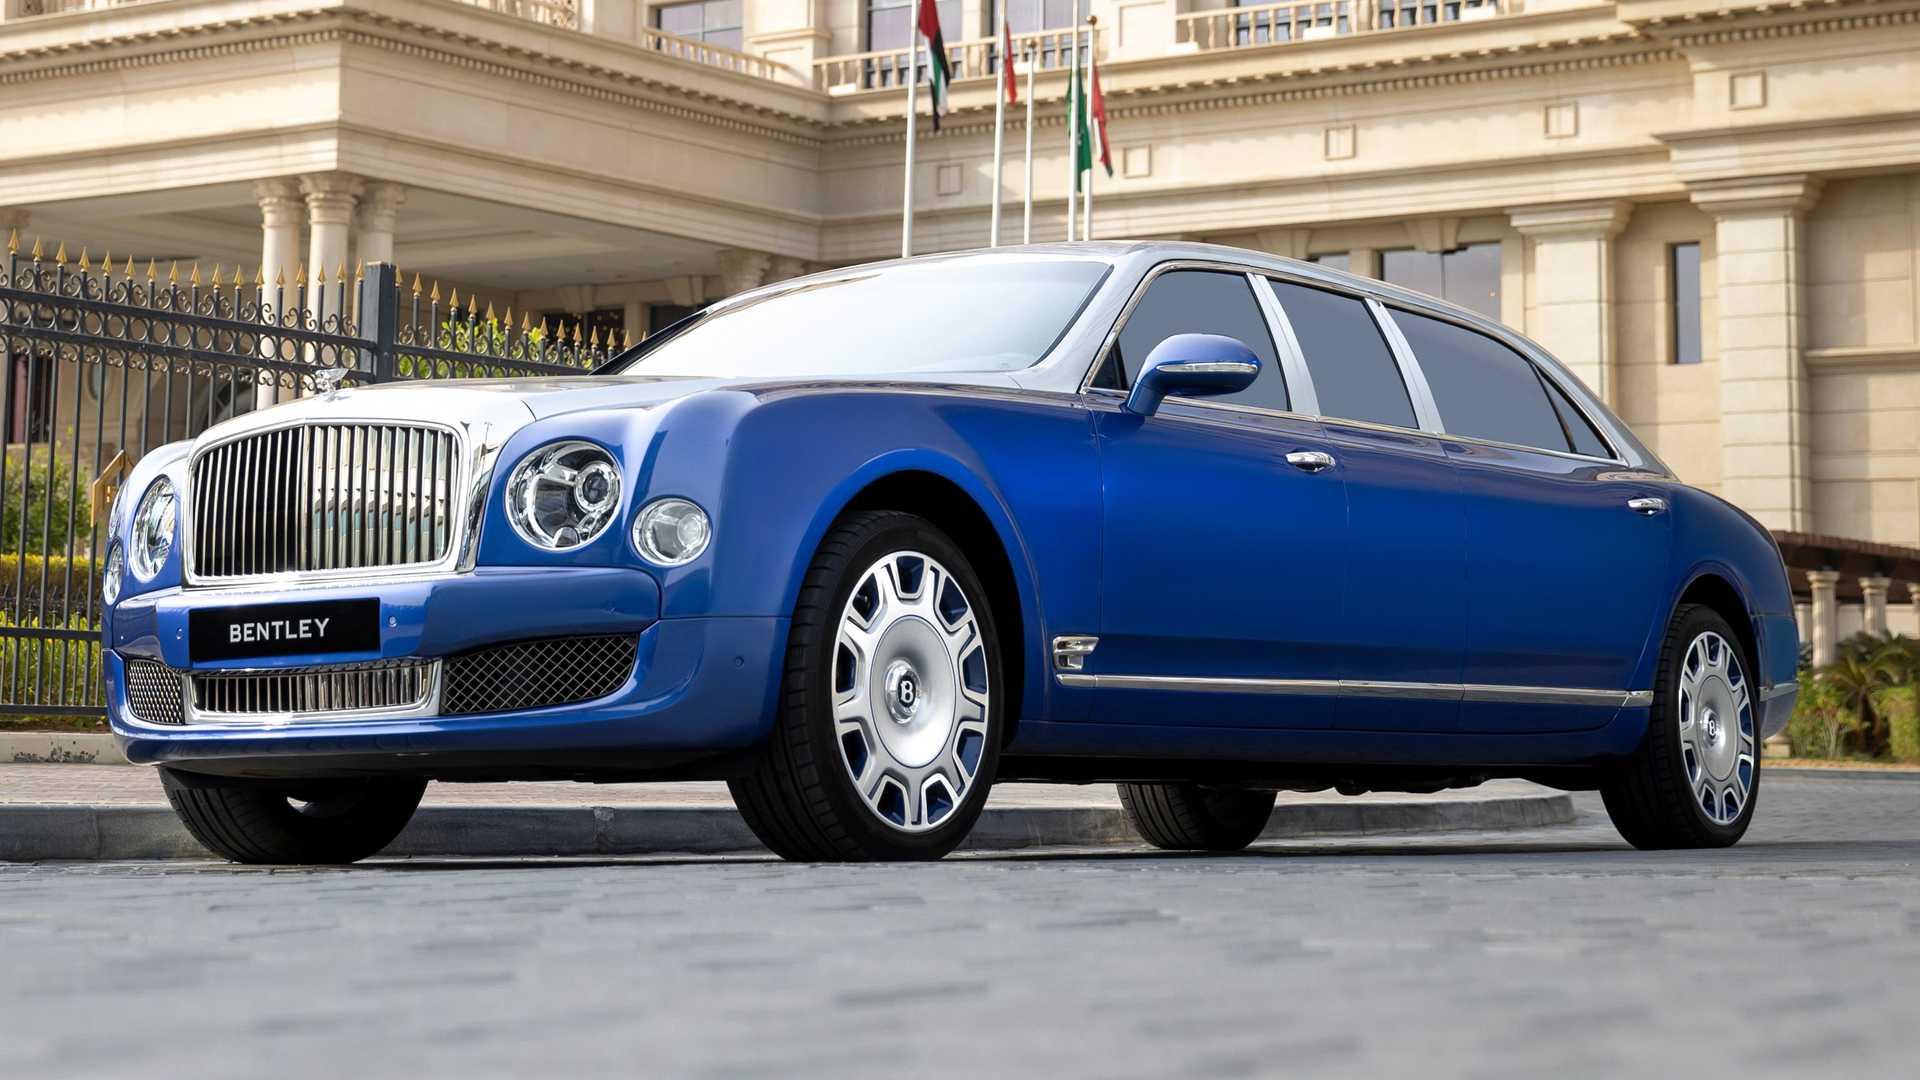 Bentley-Mulsanne-Grand-Limousine-by-Mulliner-3